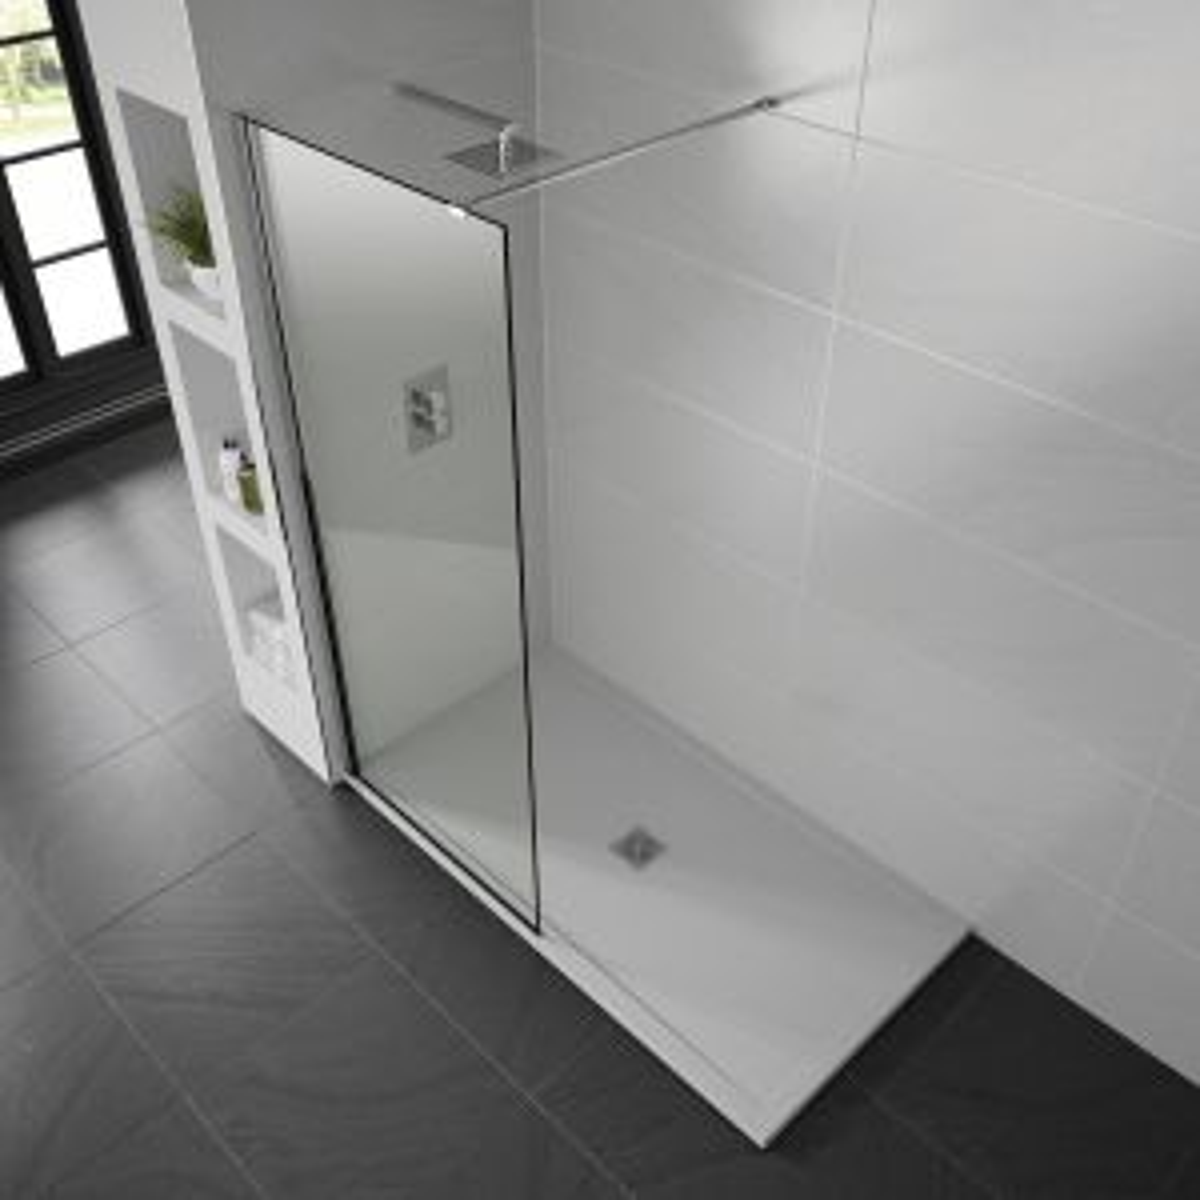 Aquadart White Slate Shower Tray 1200 x 800 Lifestyle